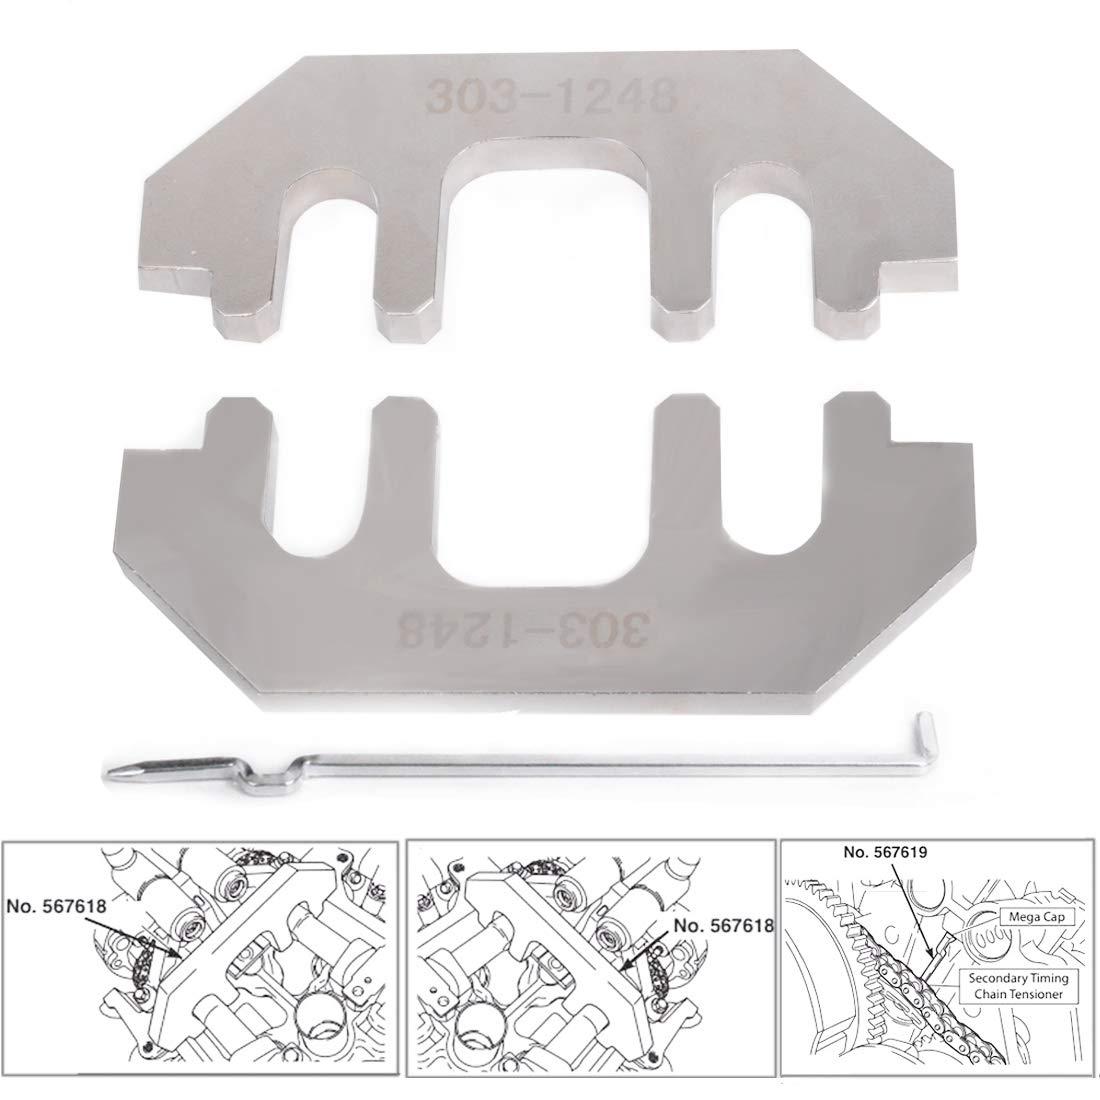 TOPNEW Cam Tool Holding Set Camshaft Holder 303-1248 for Ford 3.5L 3.7L